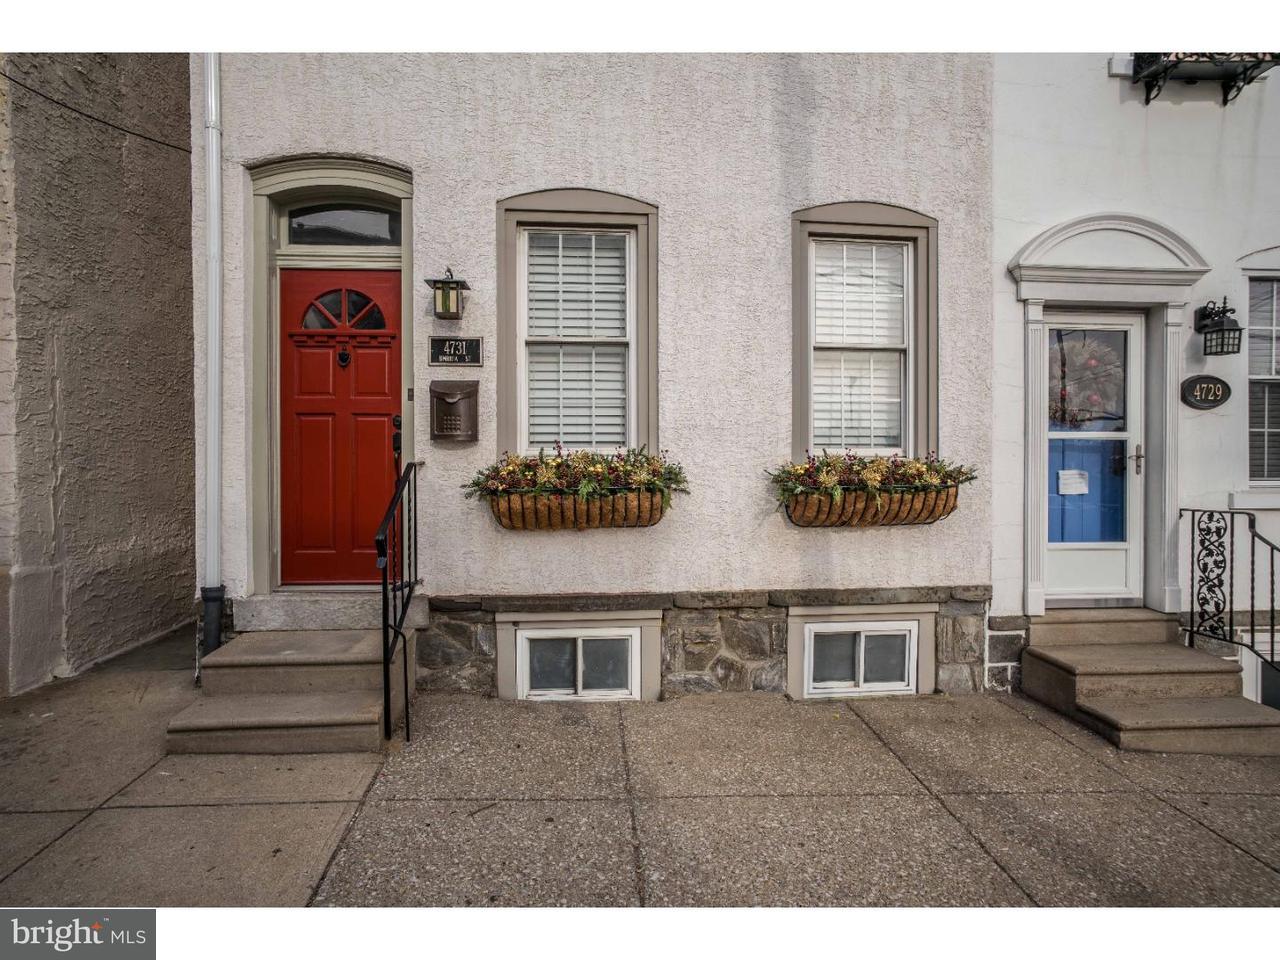 4731  Umbria Philadelphia , PA 19127